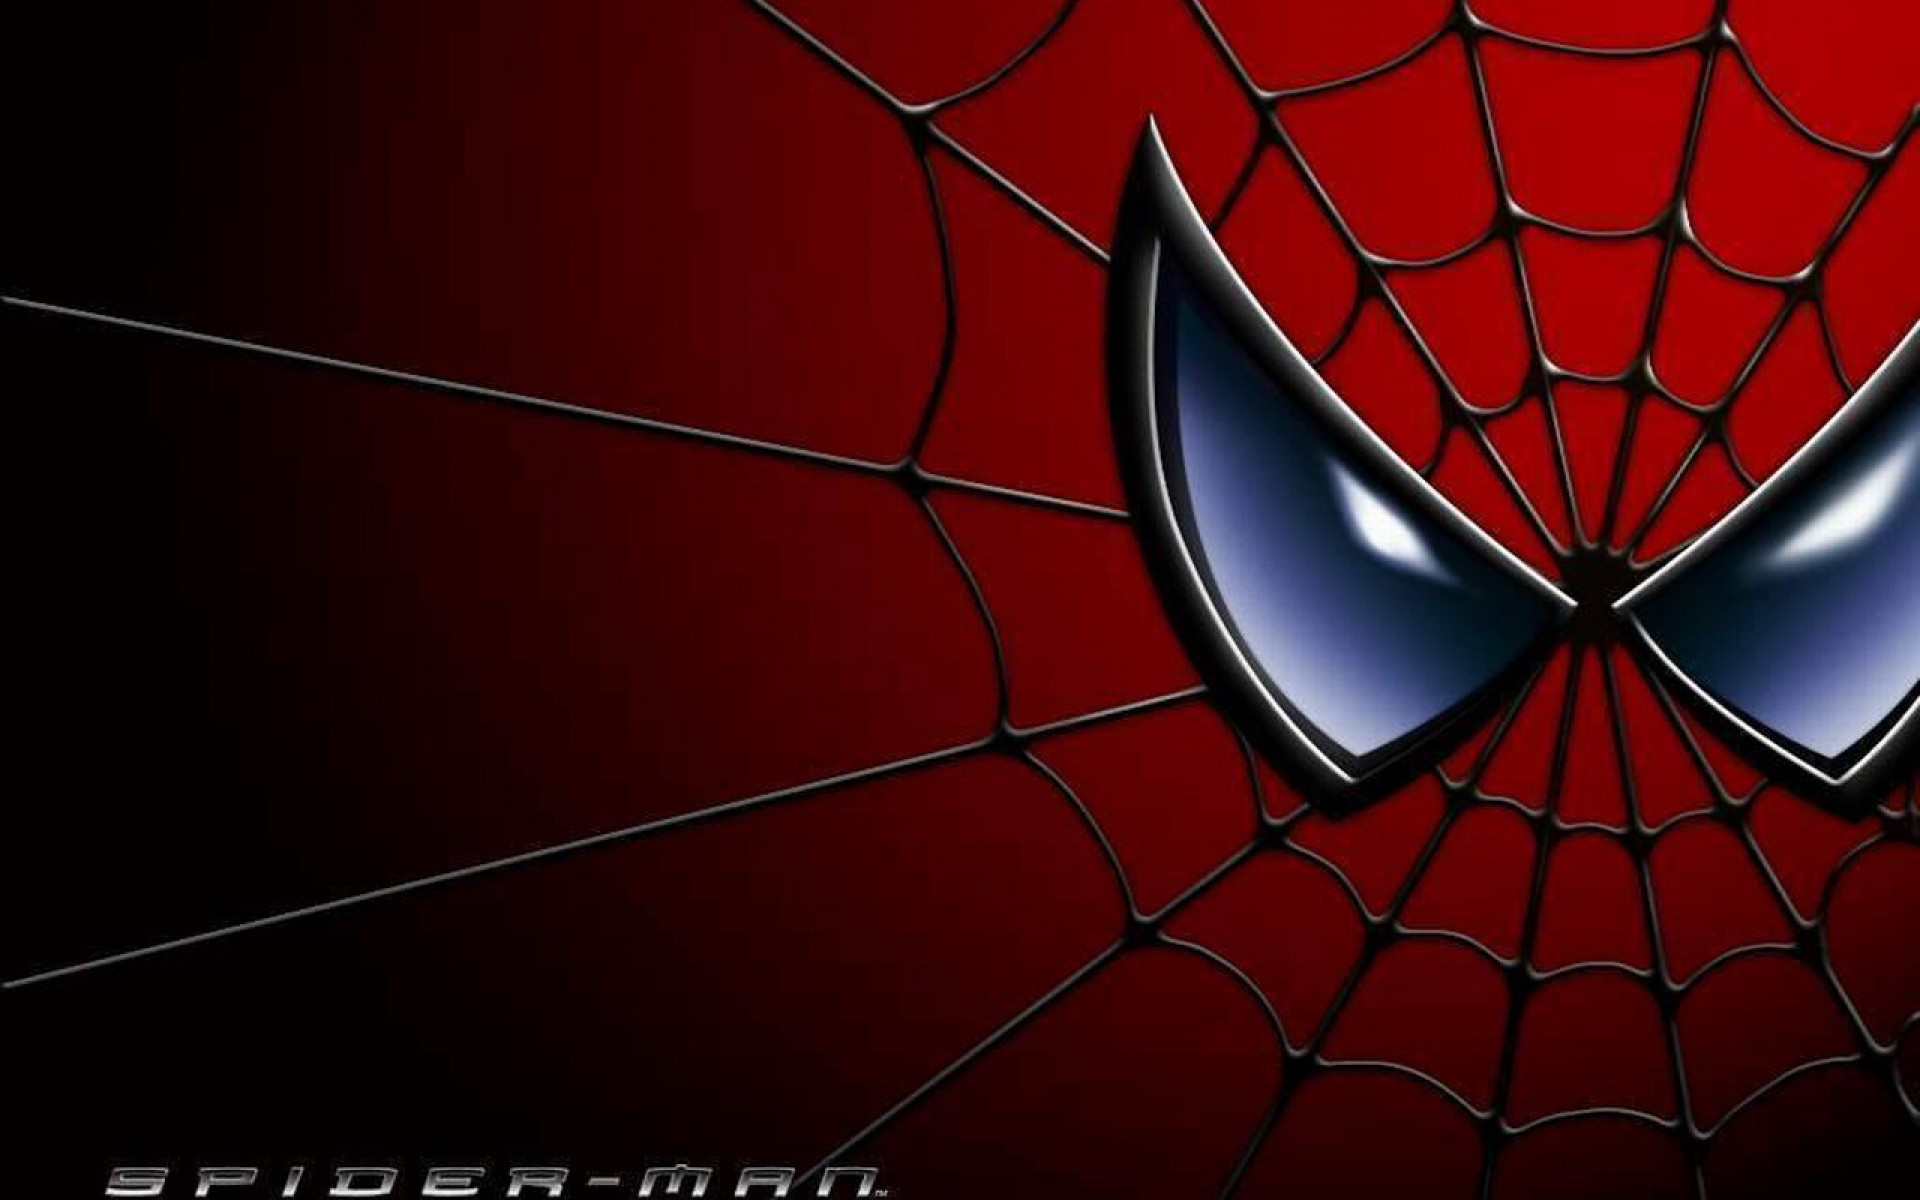 Spiderman Logo wallpaper 215574 1920x1200